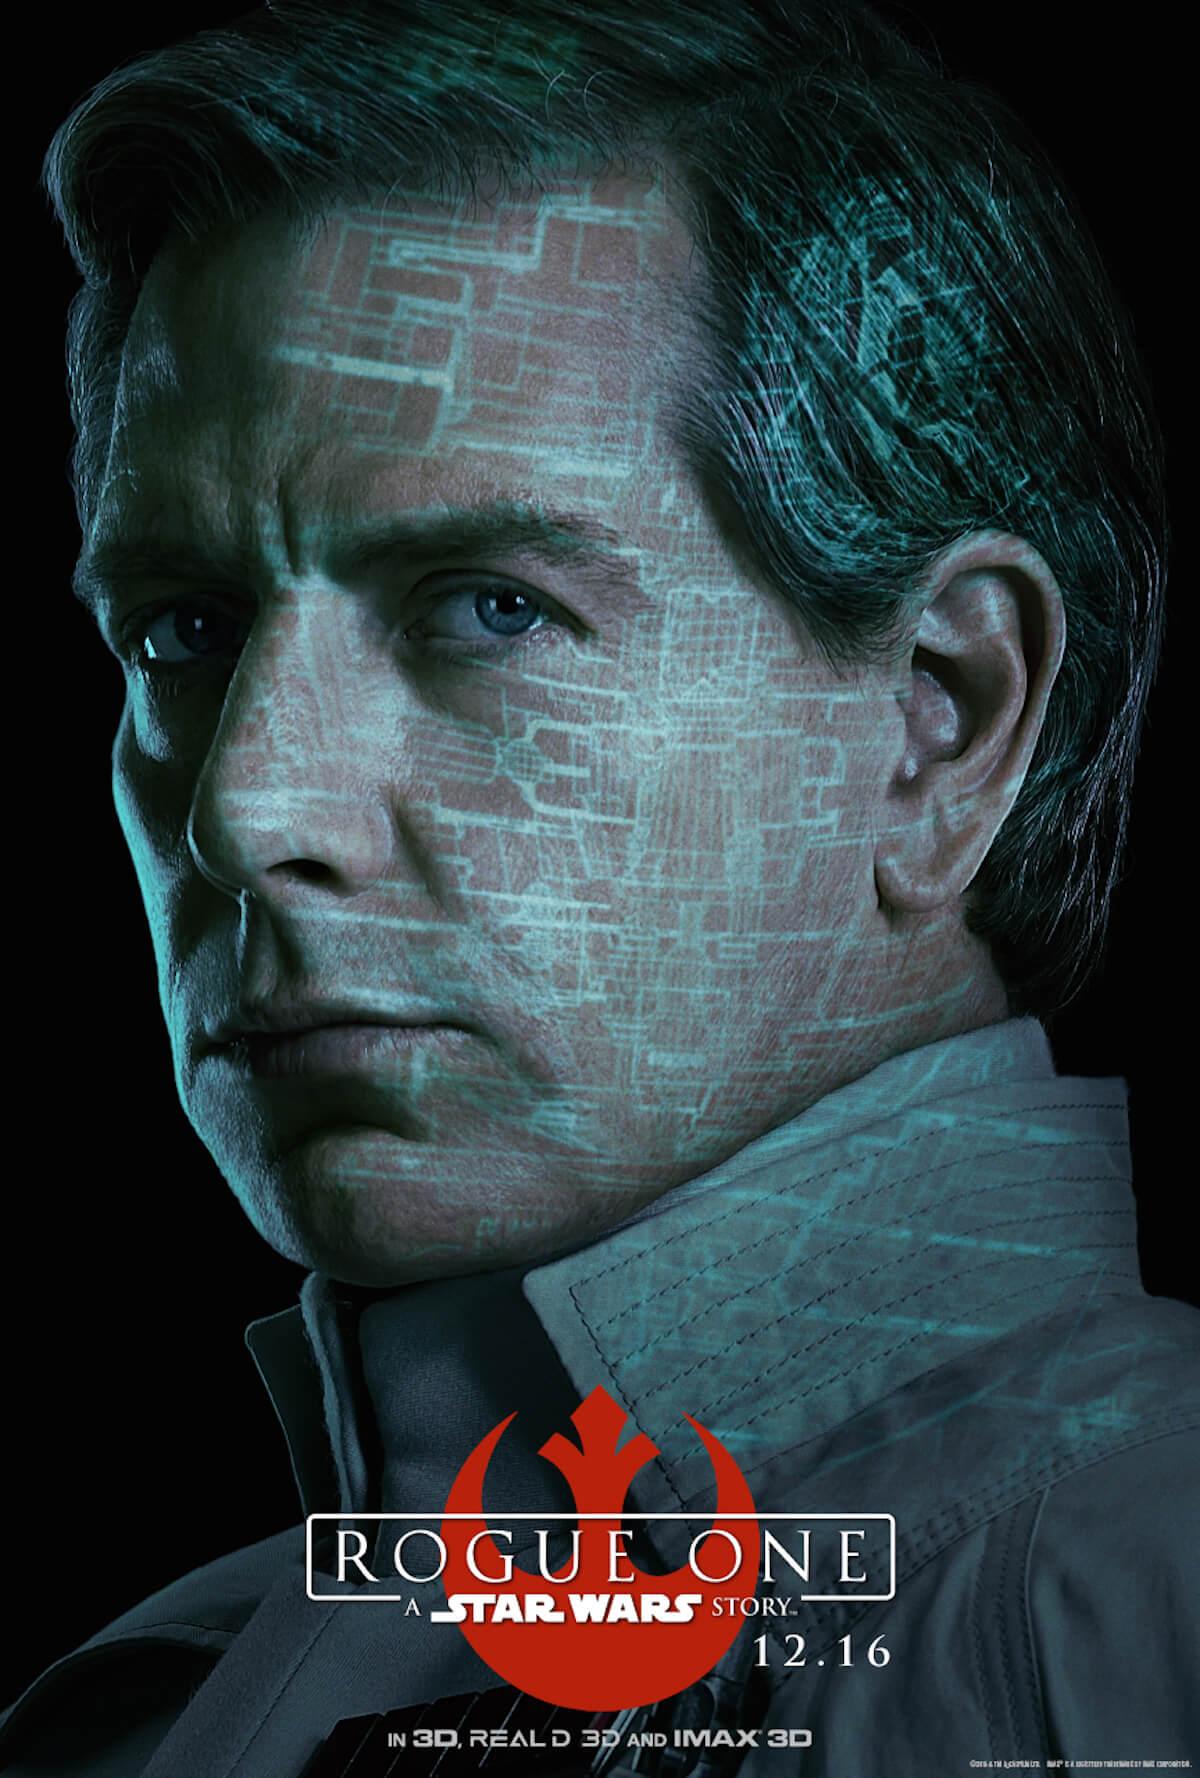 Rogue one poster ben mendelsohn